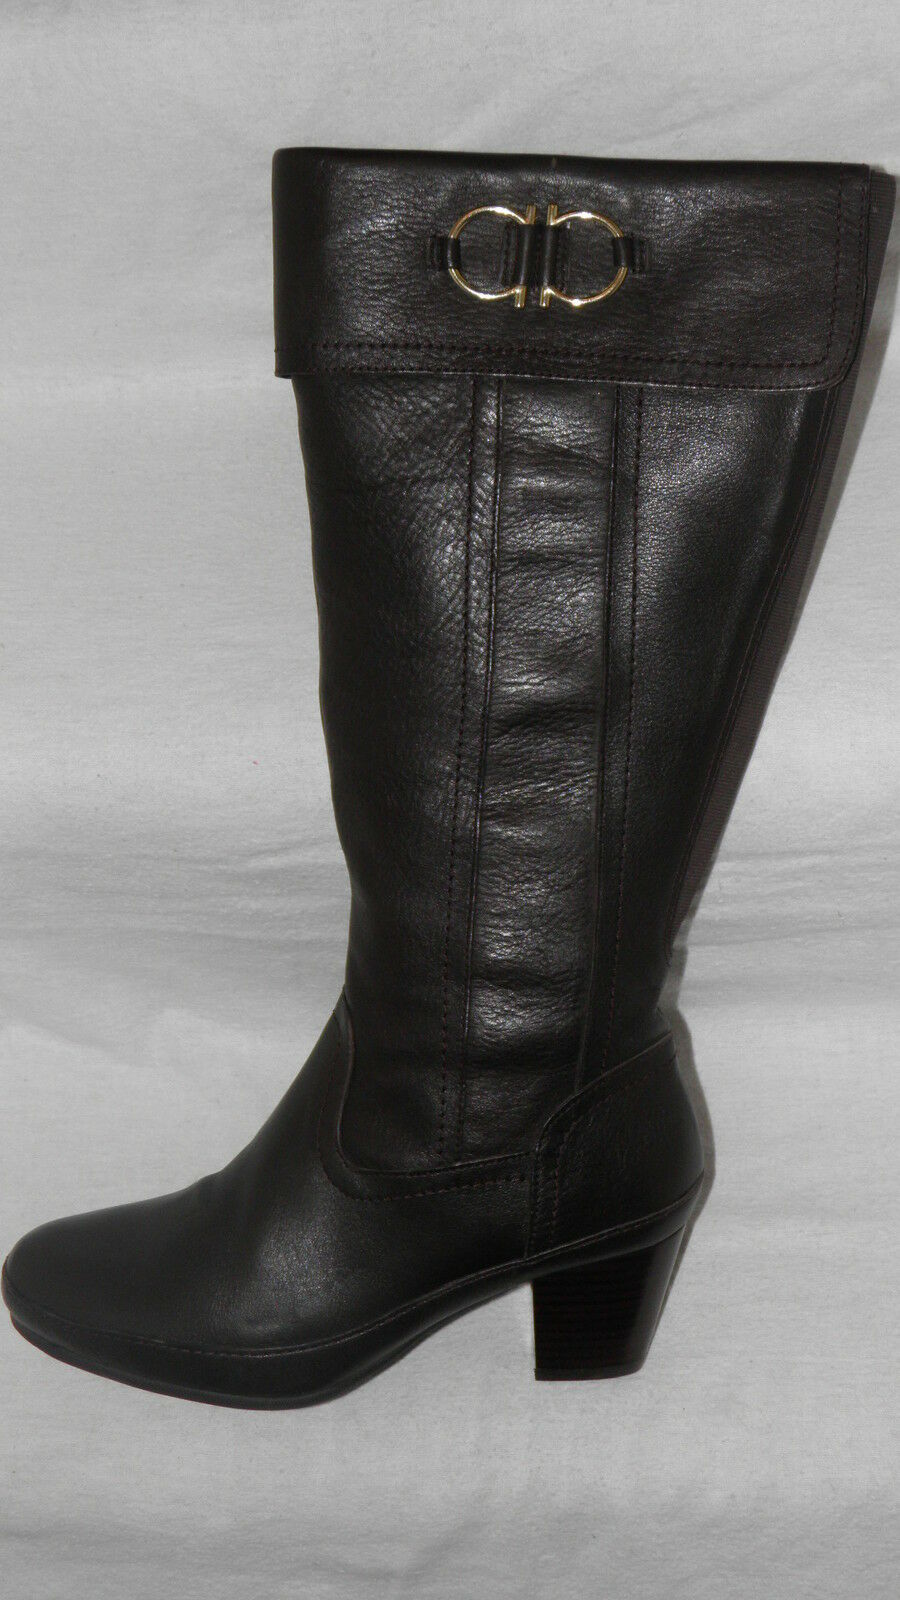 Clarks 'Midst Marlo' Dark Brown Leather knee high ladies 4.5 37.5 Boots Wide fit